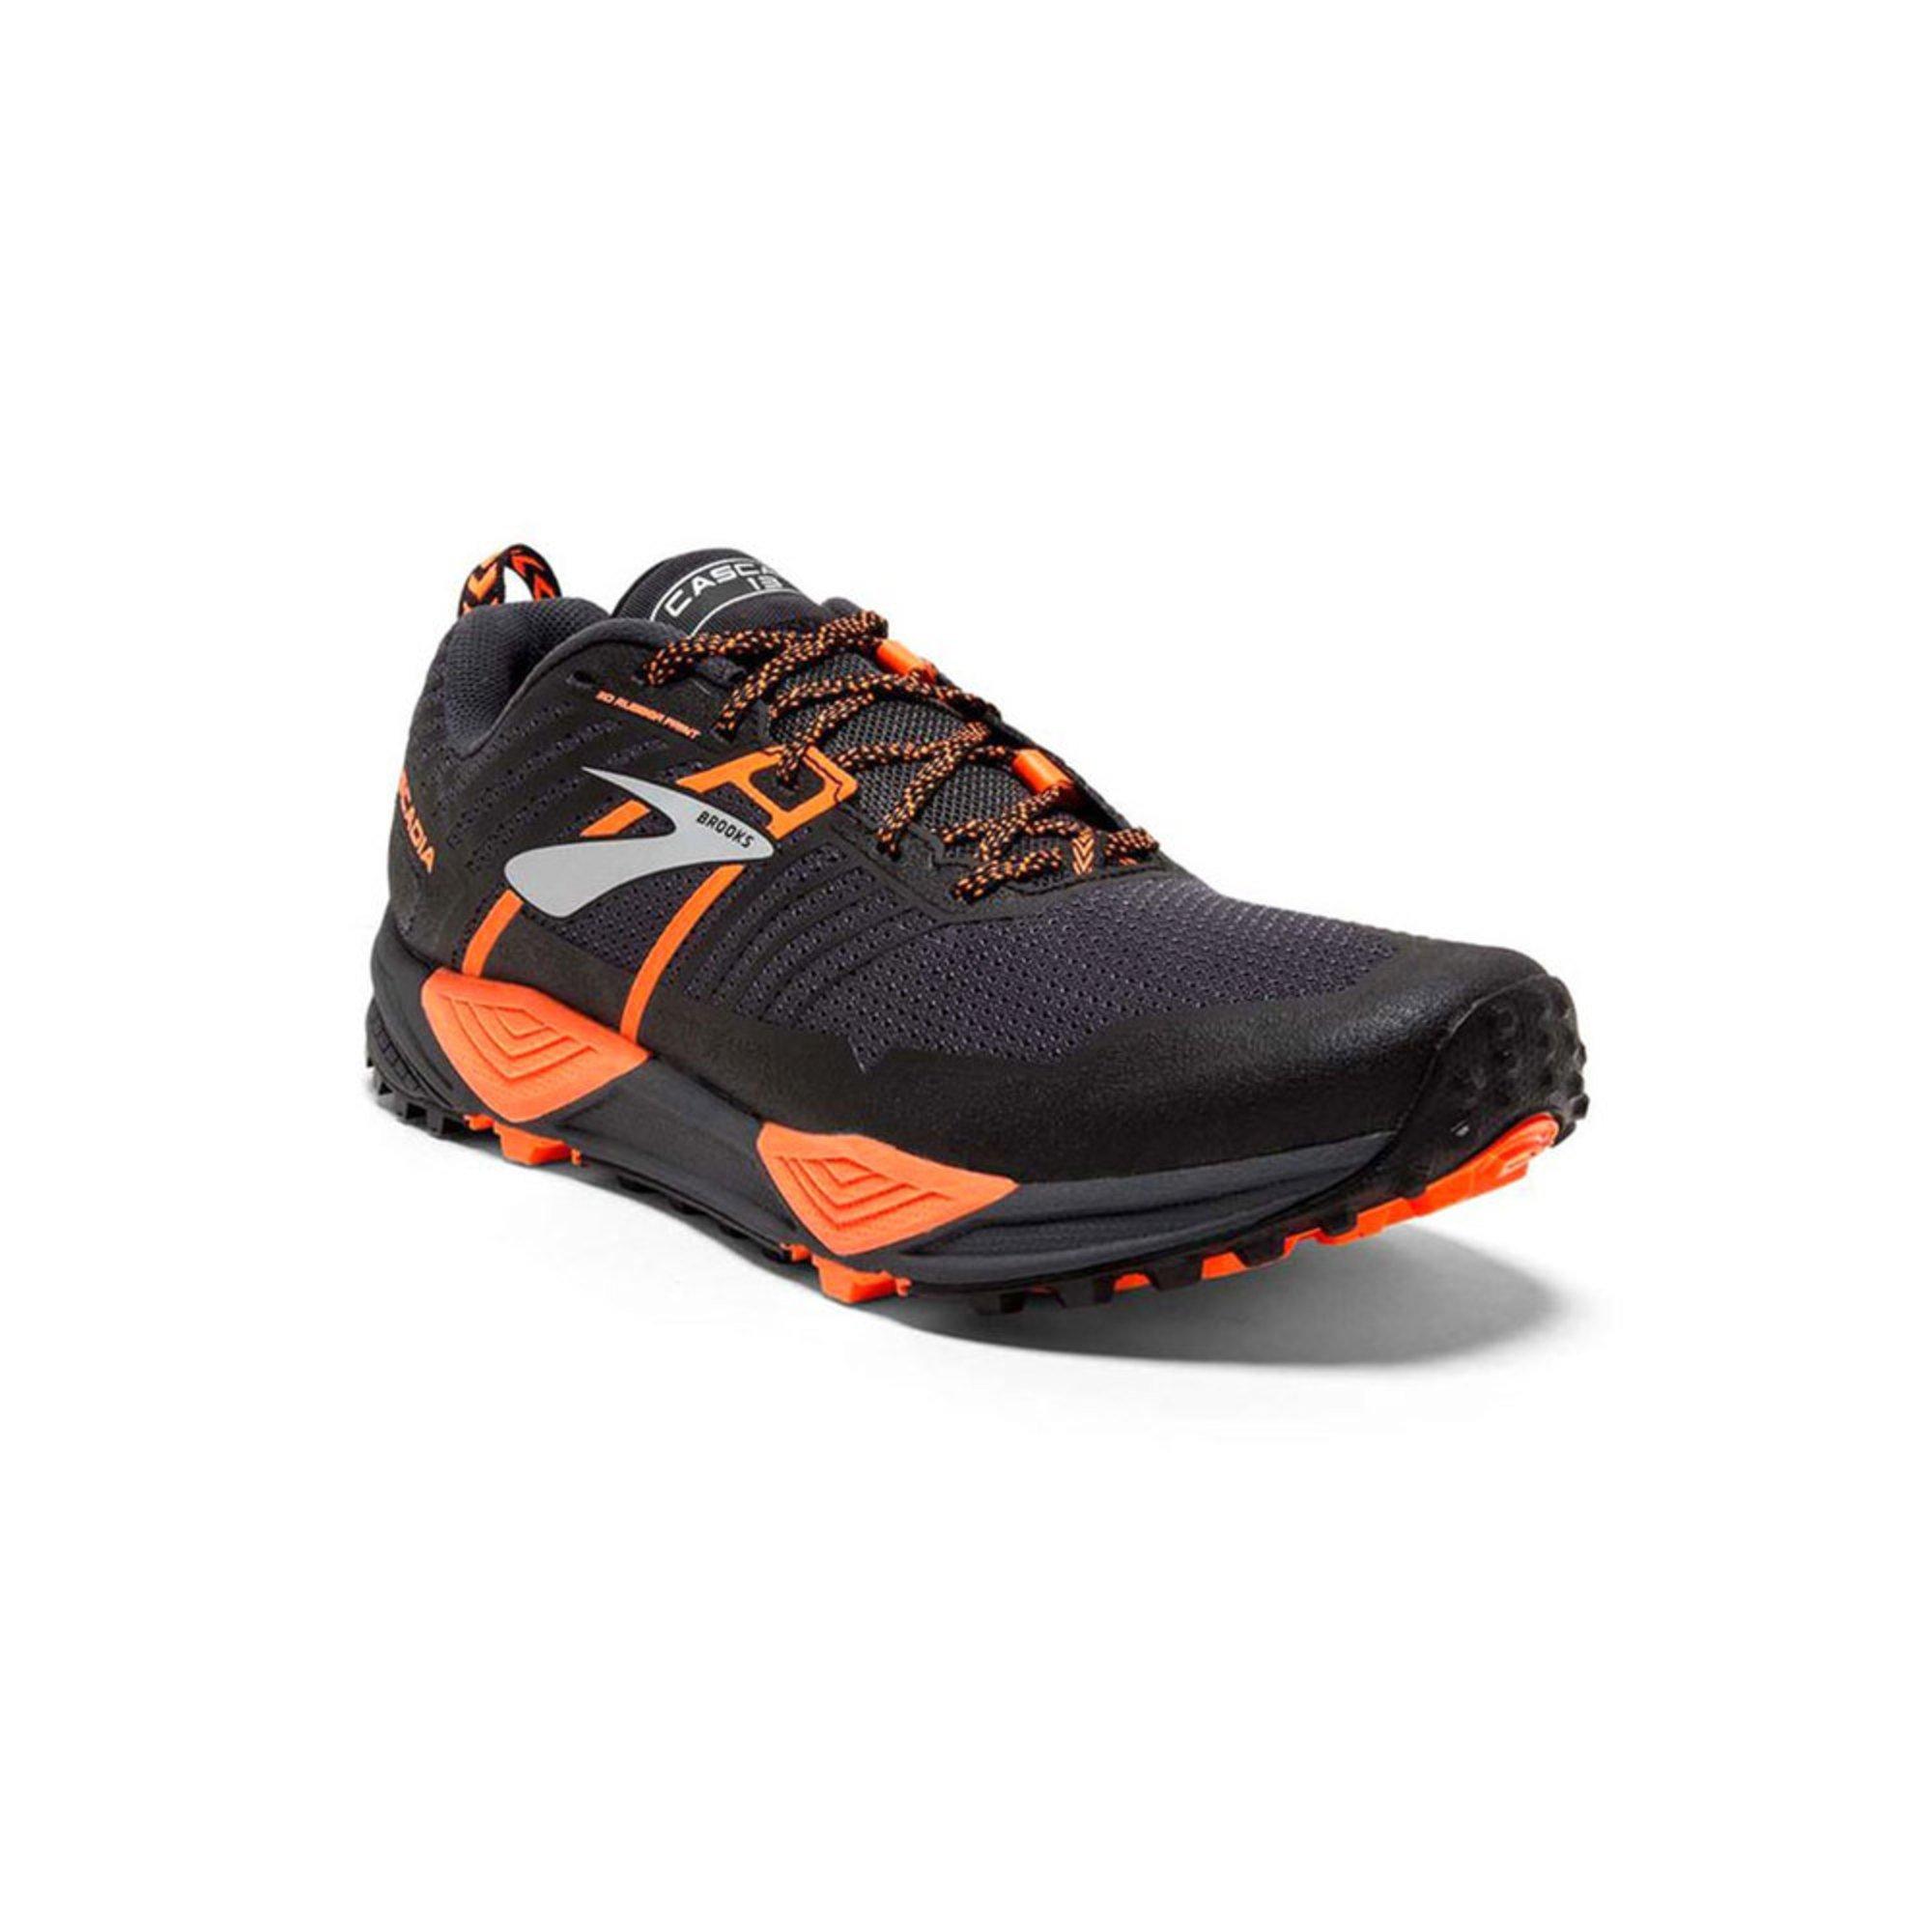 227fb76ac7d Brooks Men s Cascadia 13 Trail Running Shoe